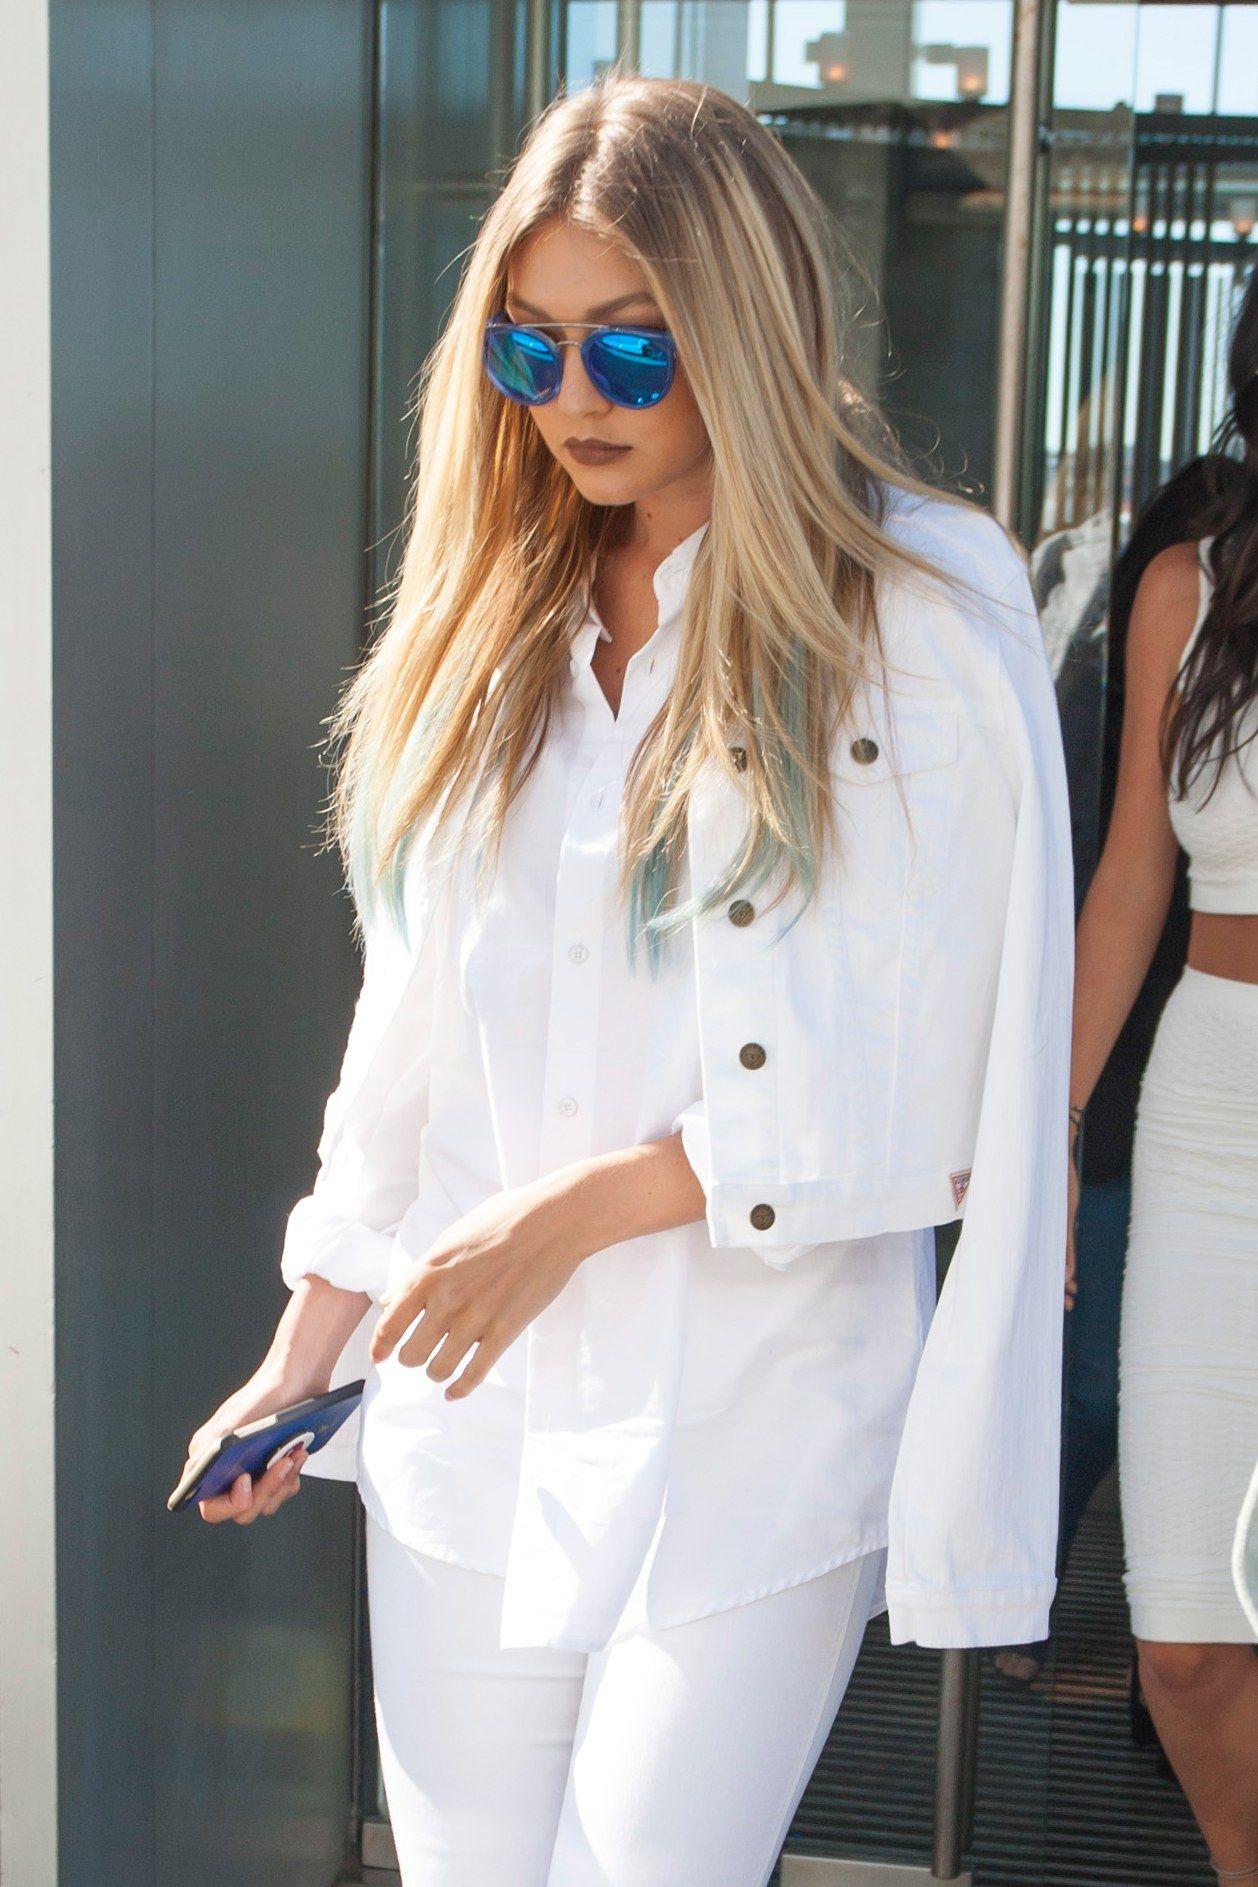 Beach Hair Backlash: Gigi Hadid, Olivia Munn, and More Embrace Summertime Straight